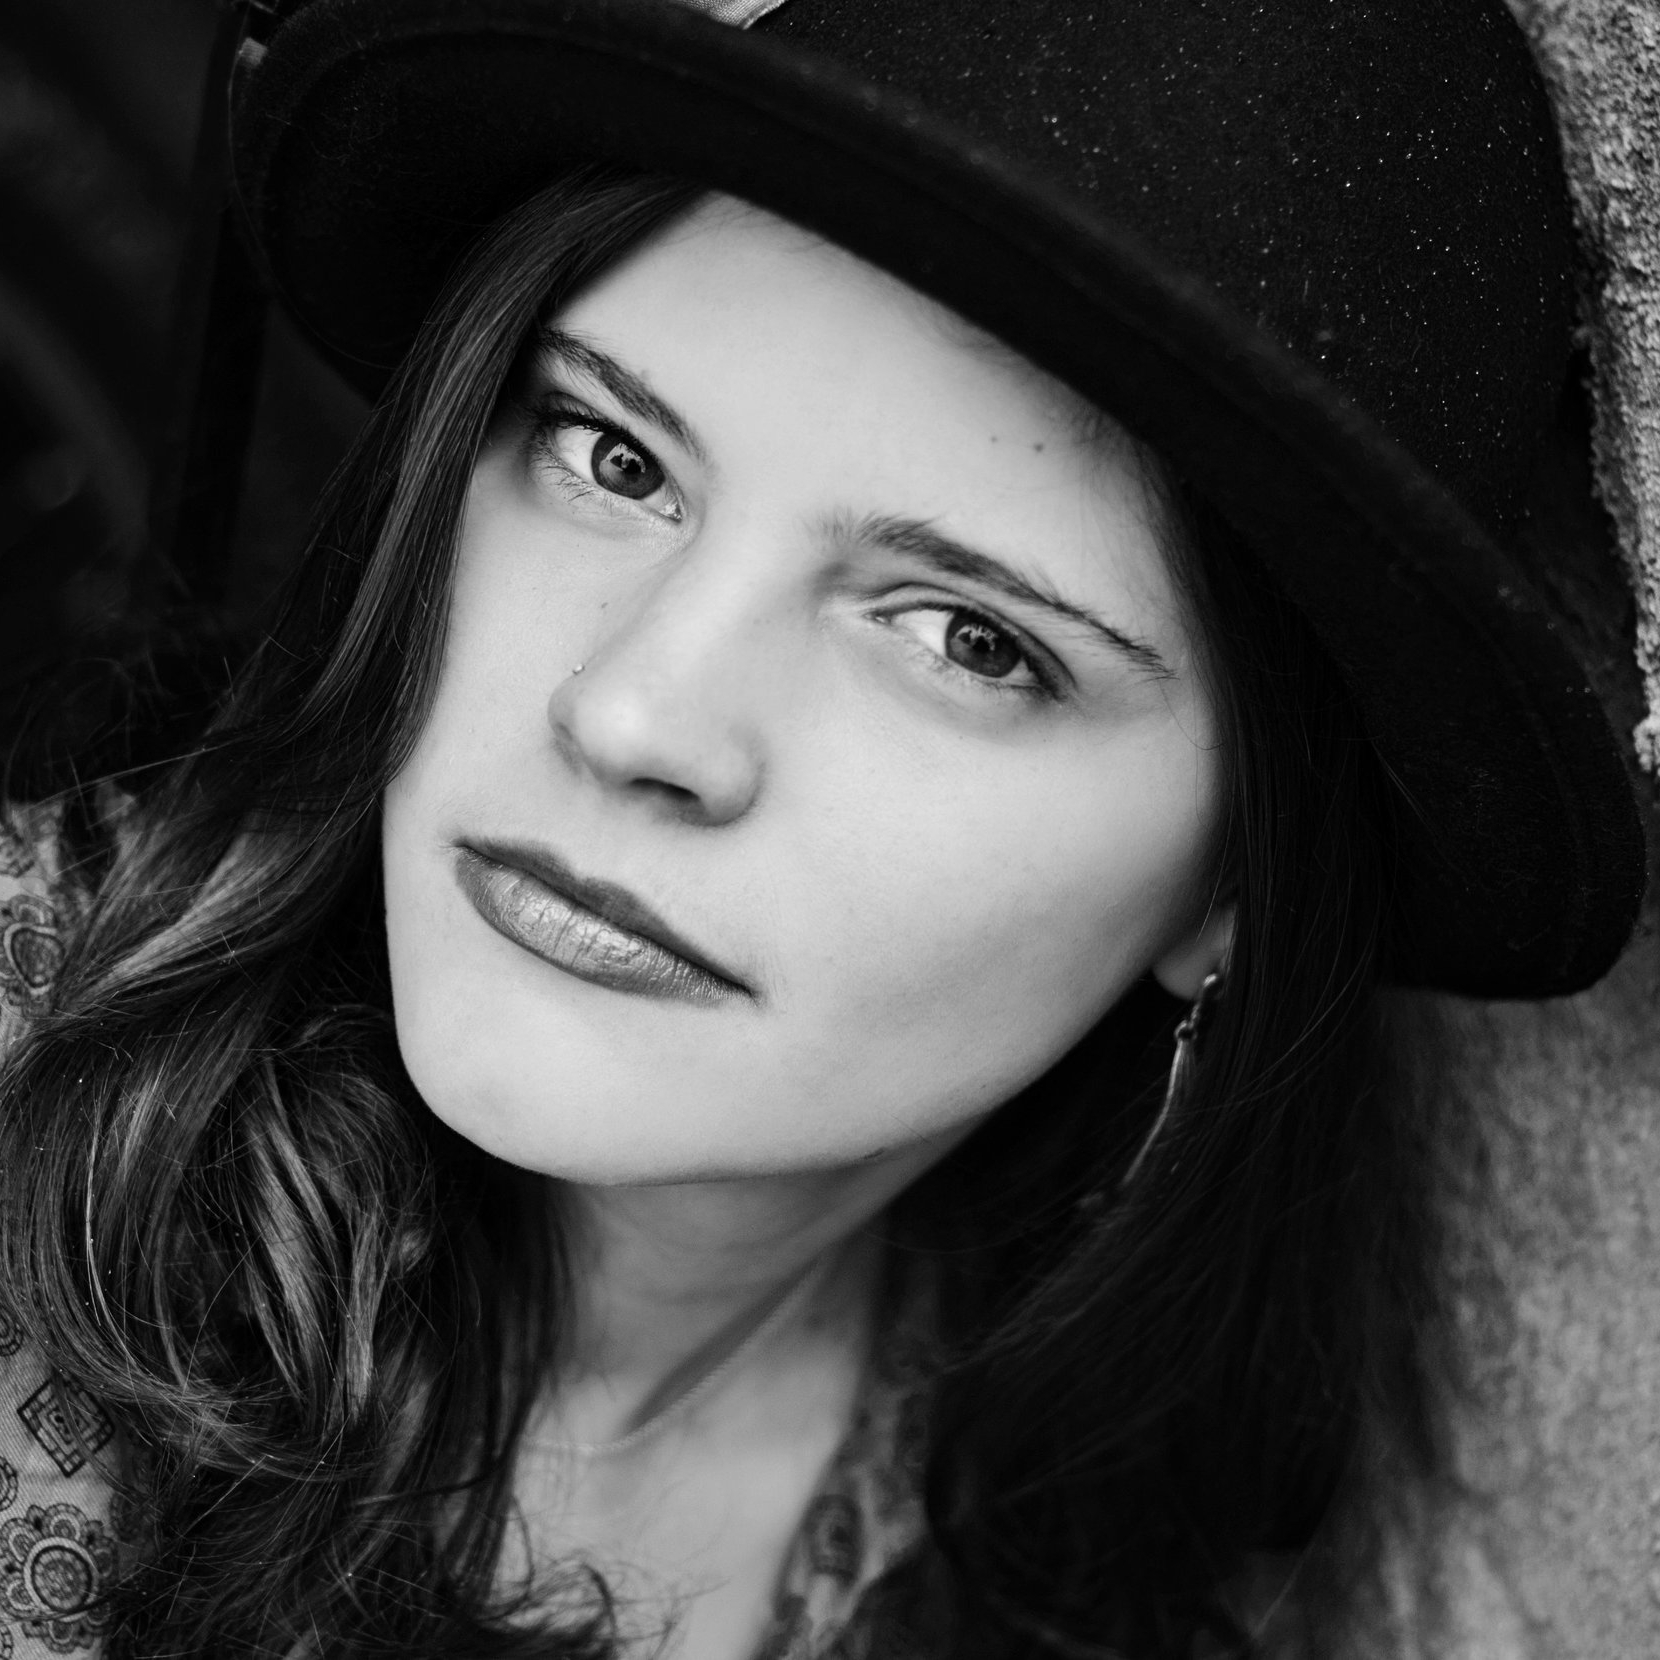 Soprano Anaïs Naharro-Murphy - plays the role of Director